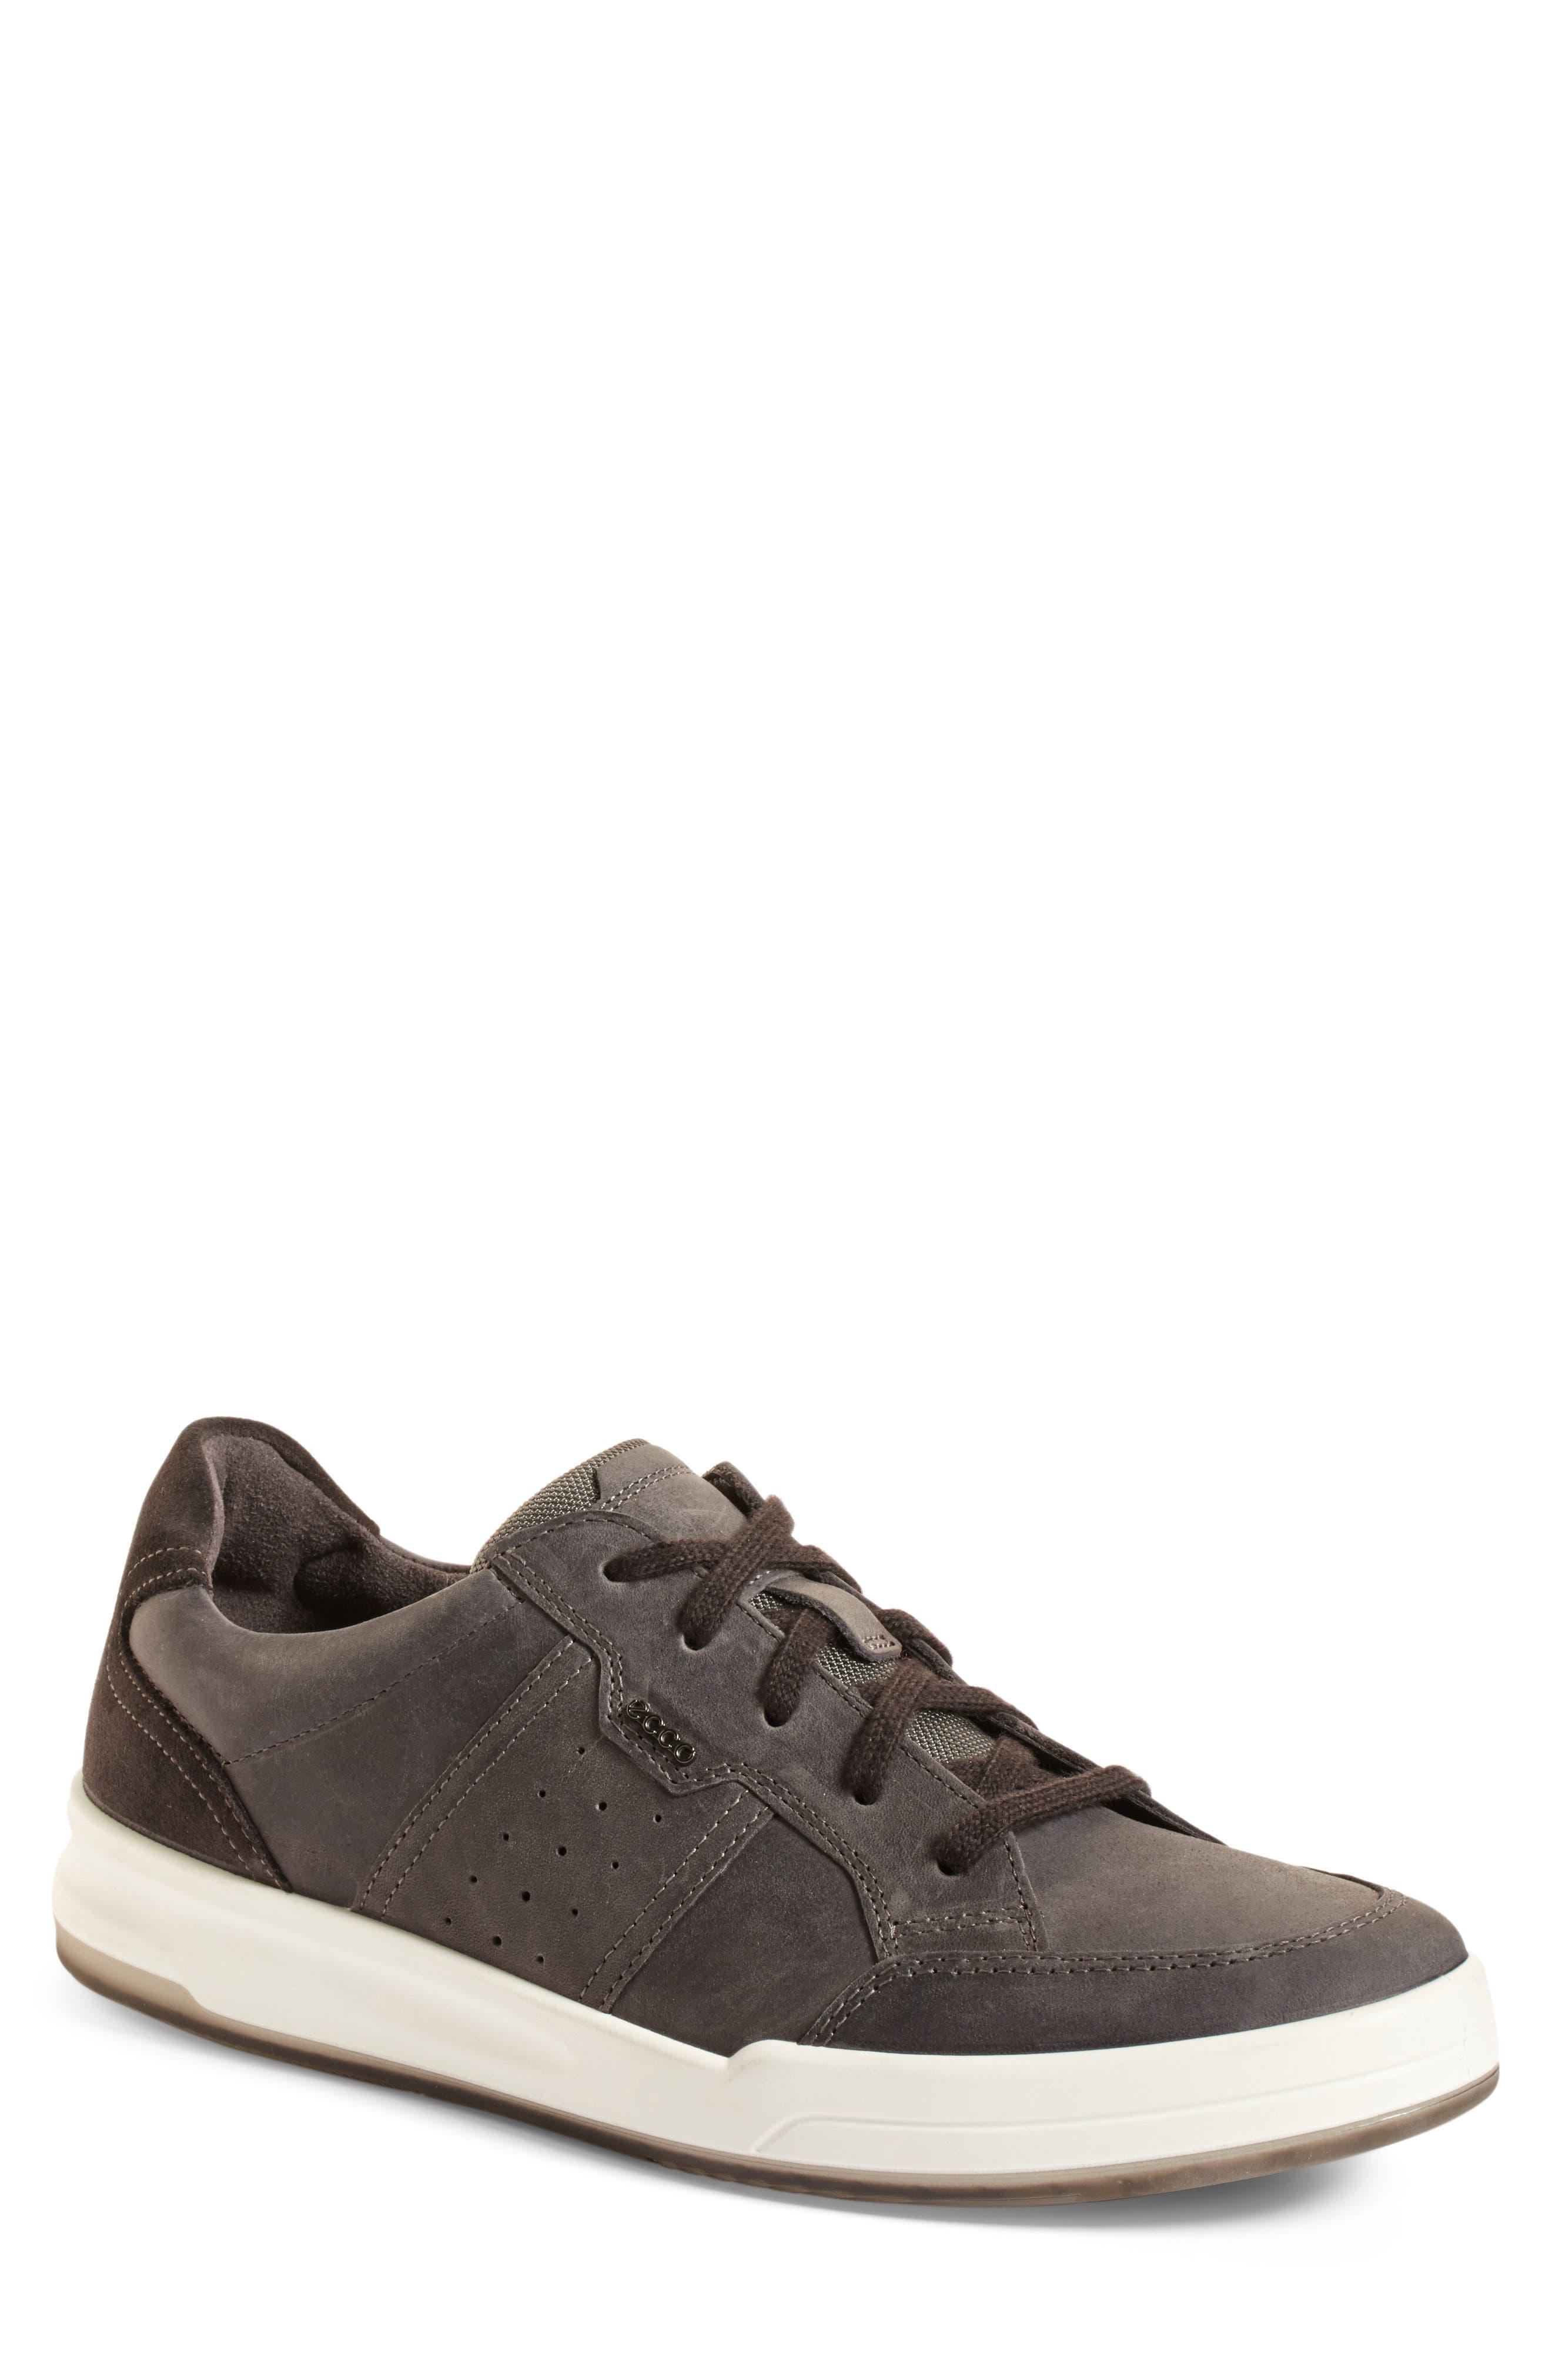 Alternate Image 1 Selected - ECCO 'Jack' Sneaker (Men)